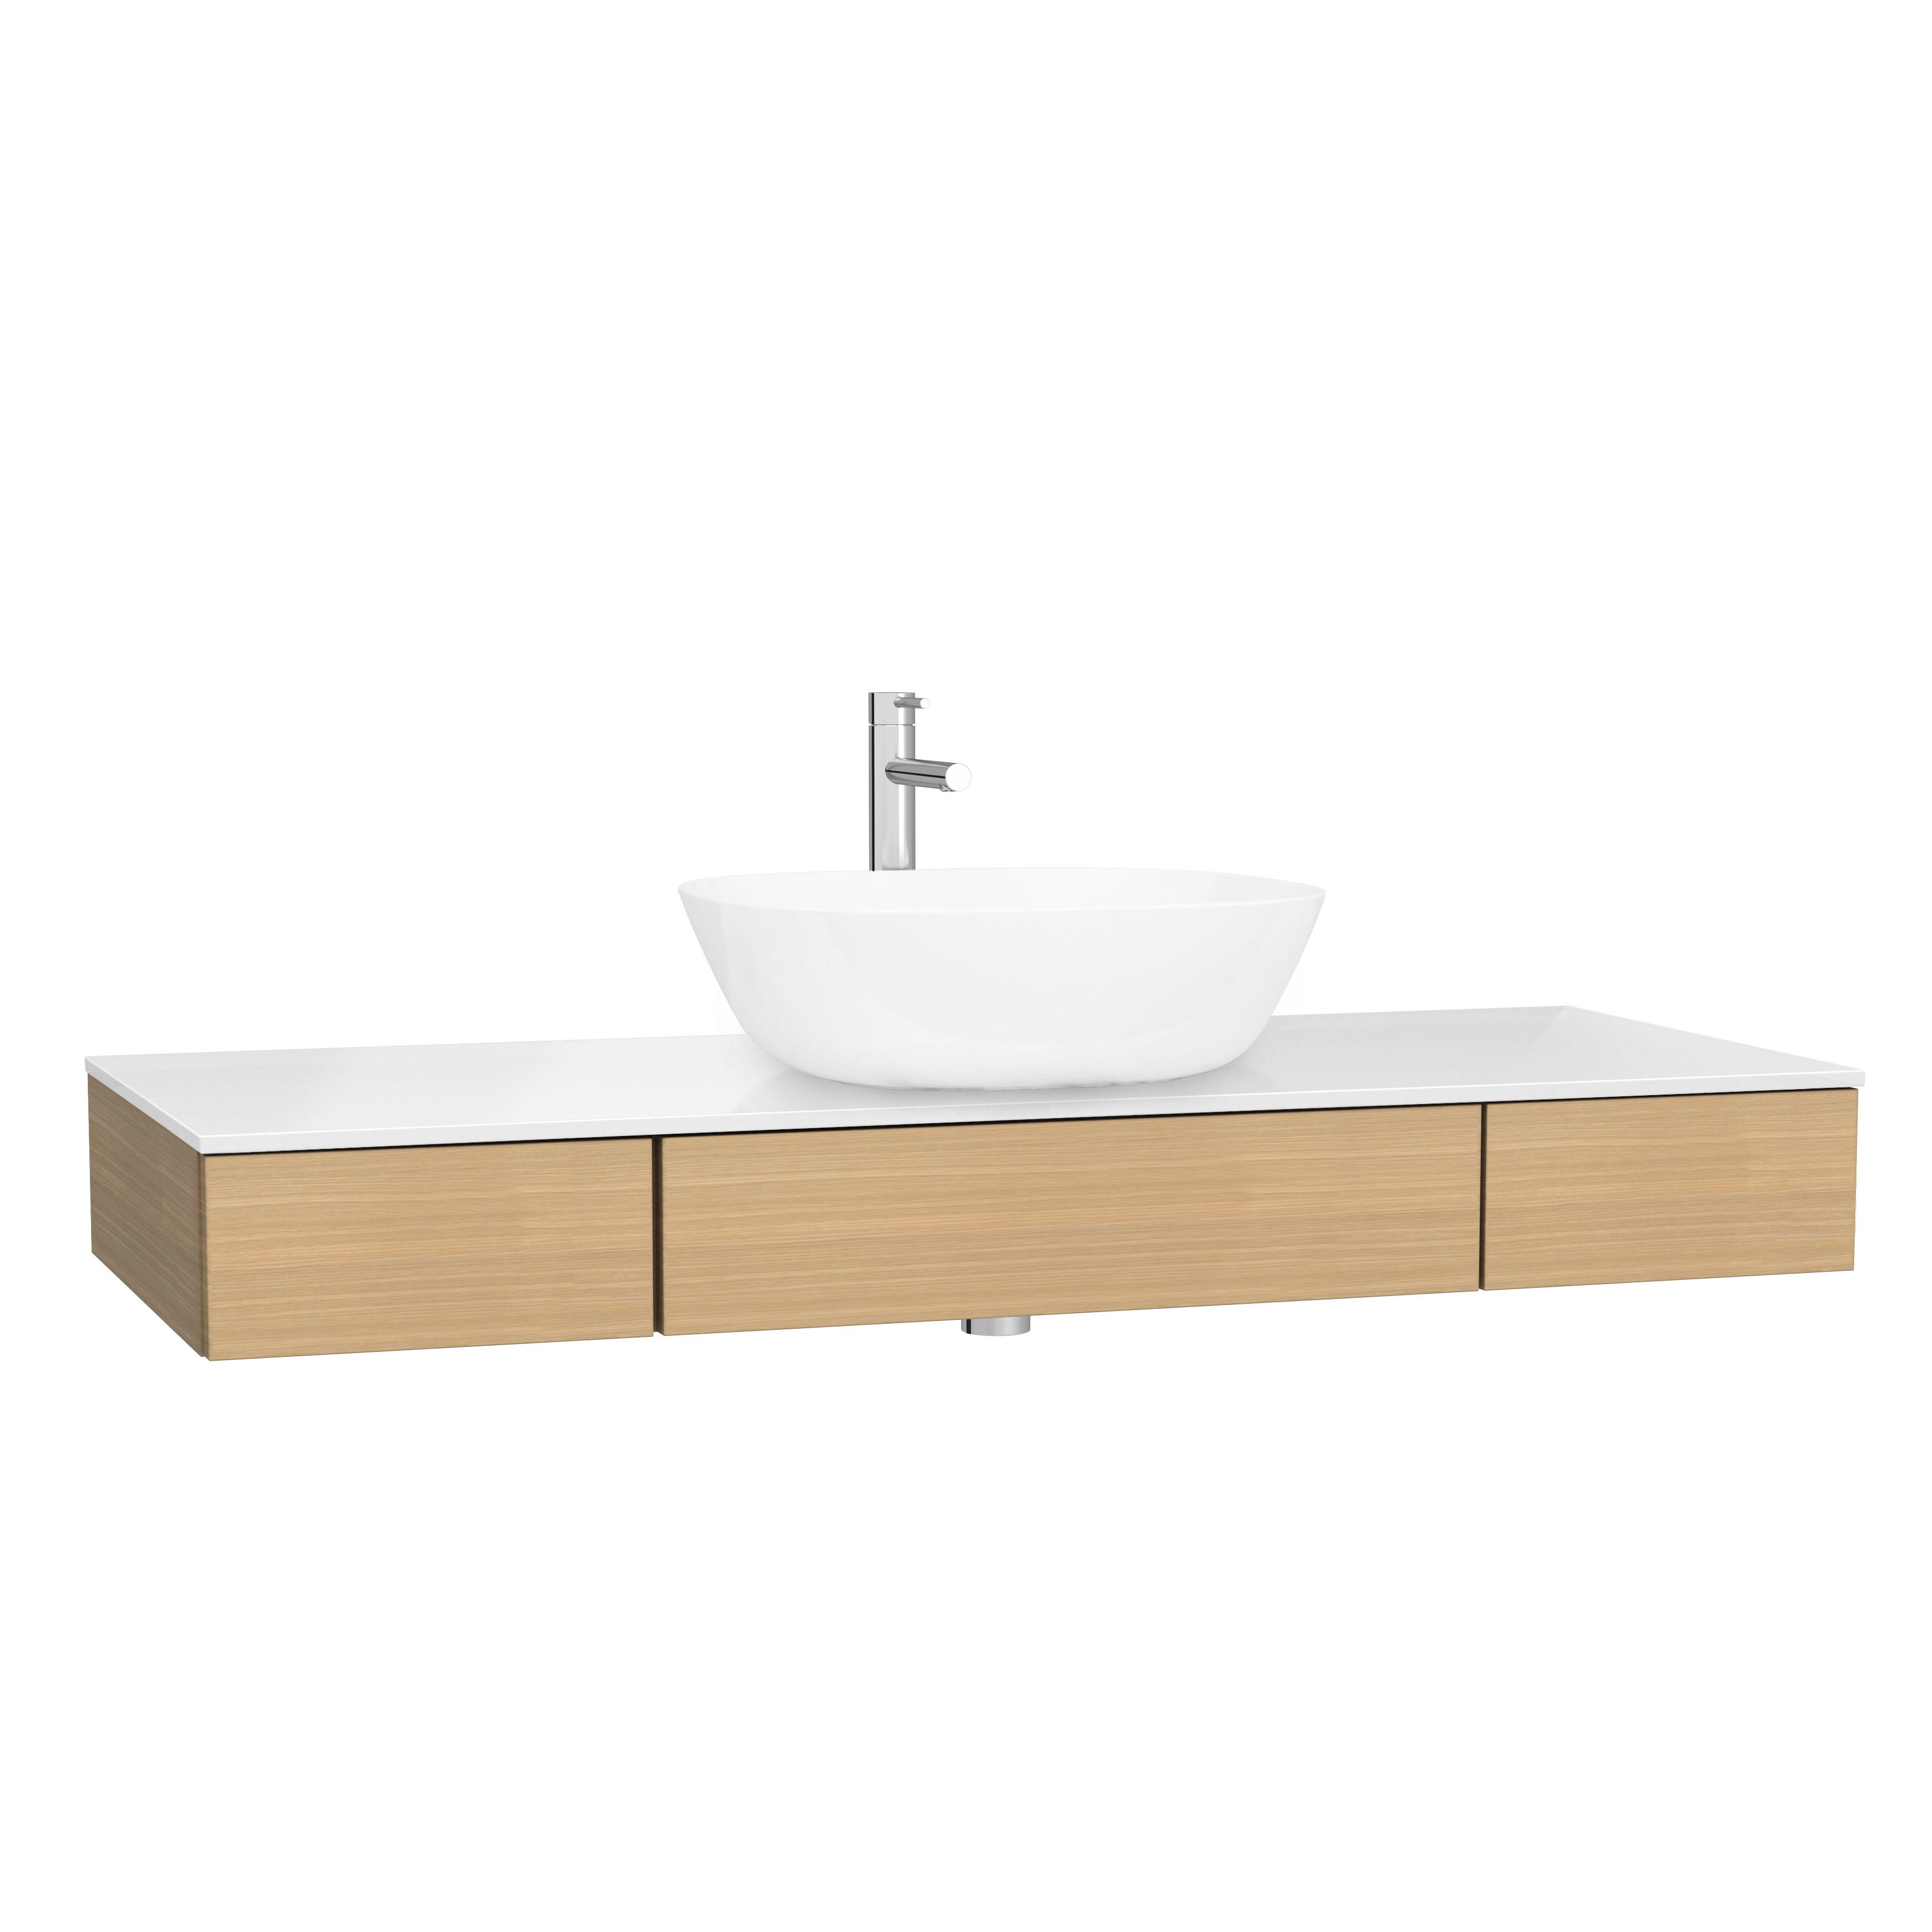 Origin plan de toilette avec tiroir, 120 cm, chêne ferrera, centre